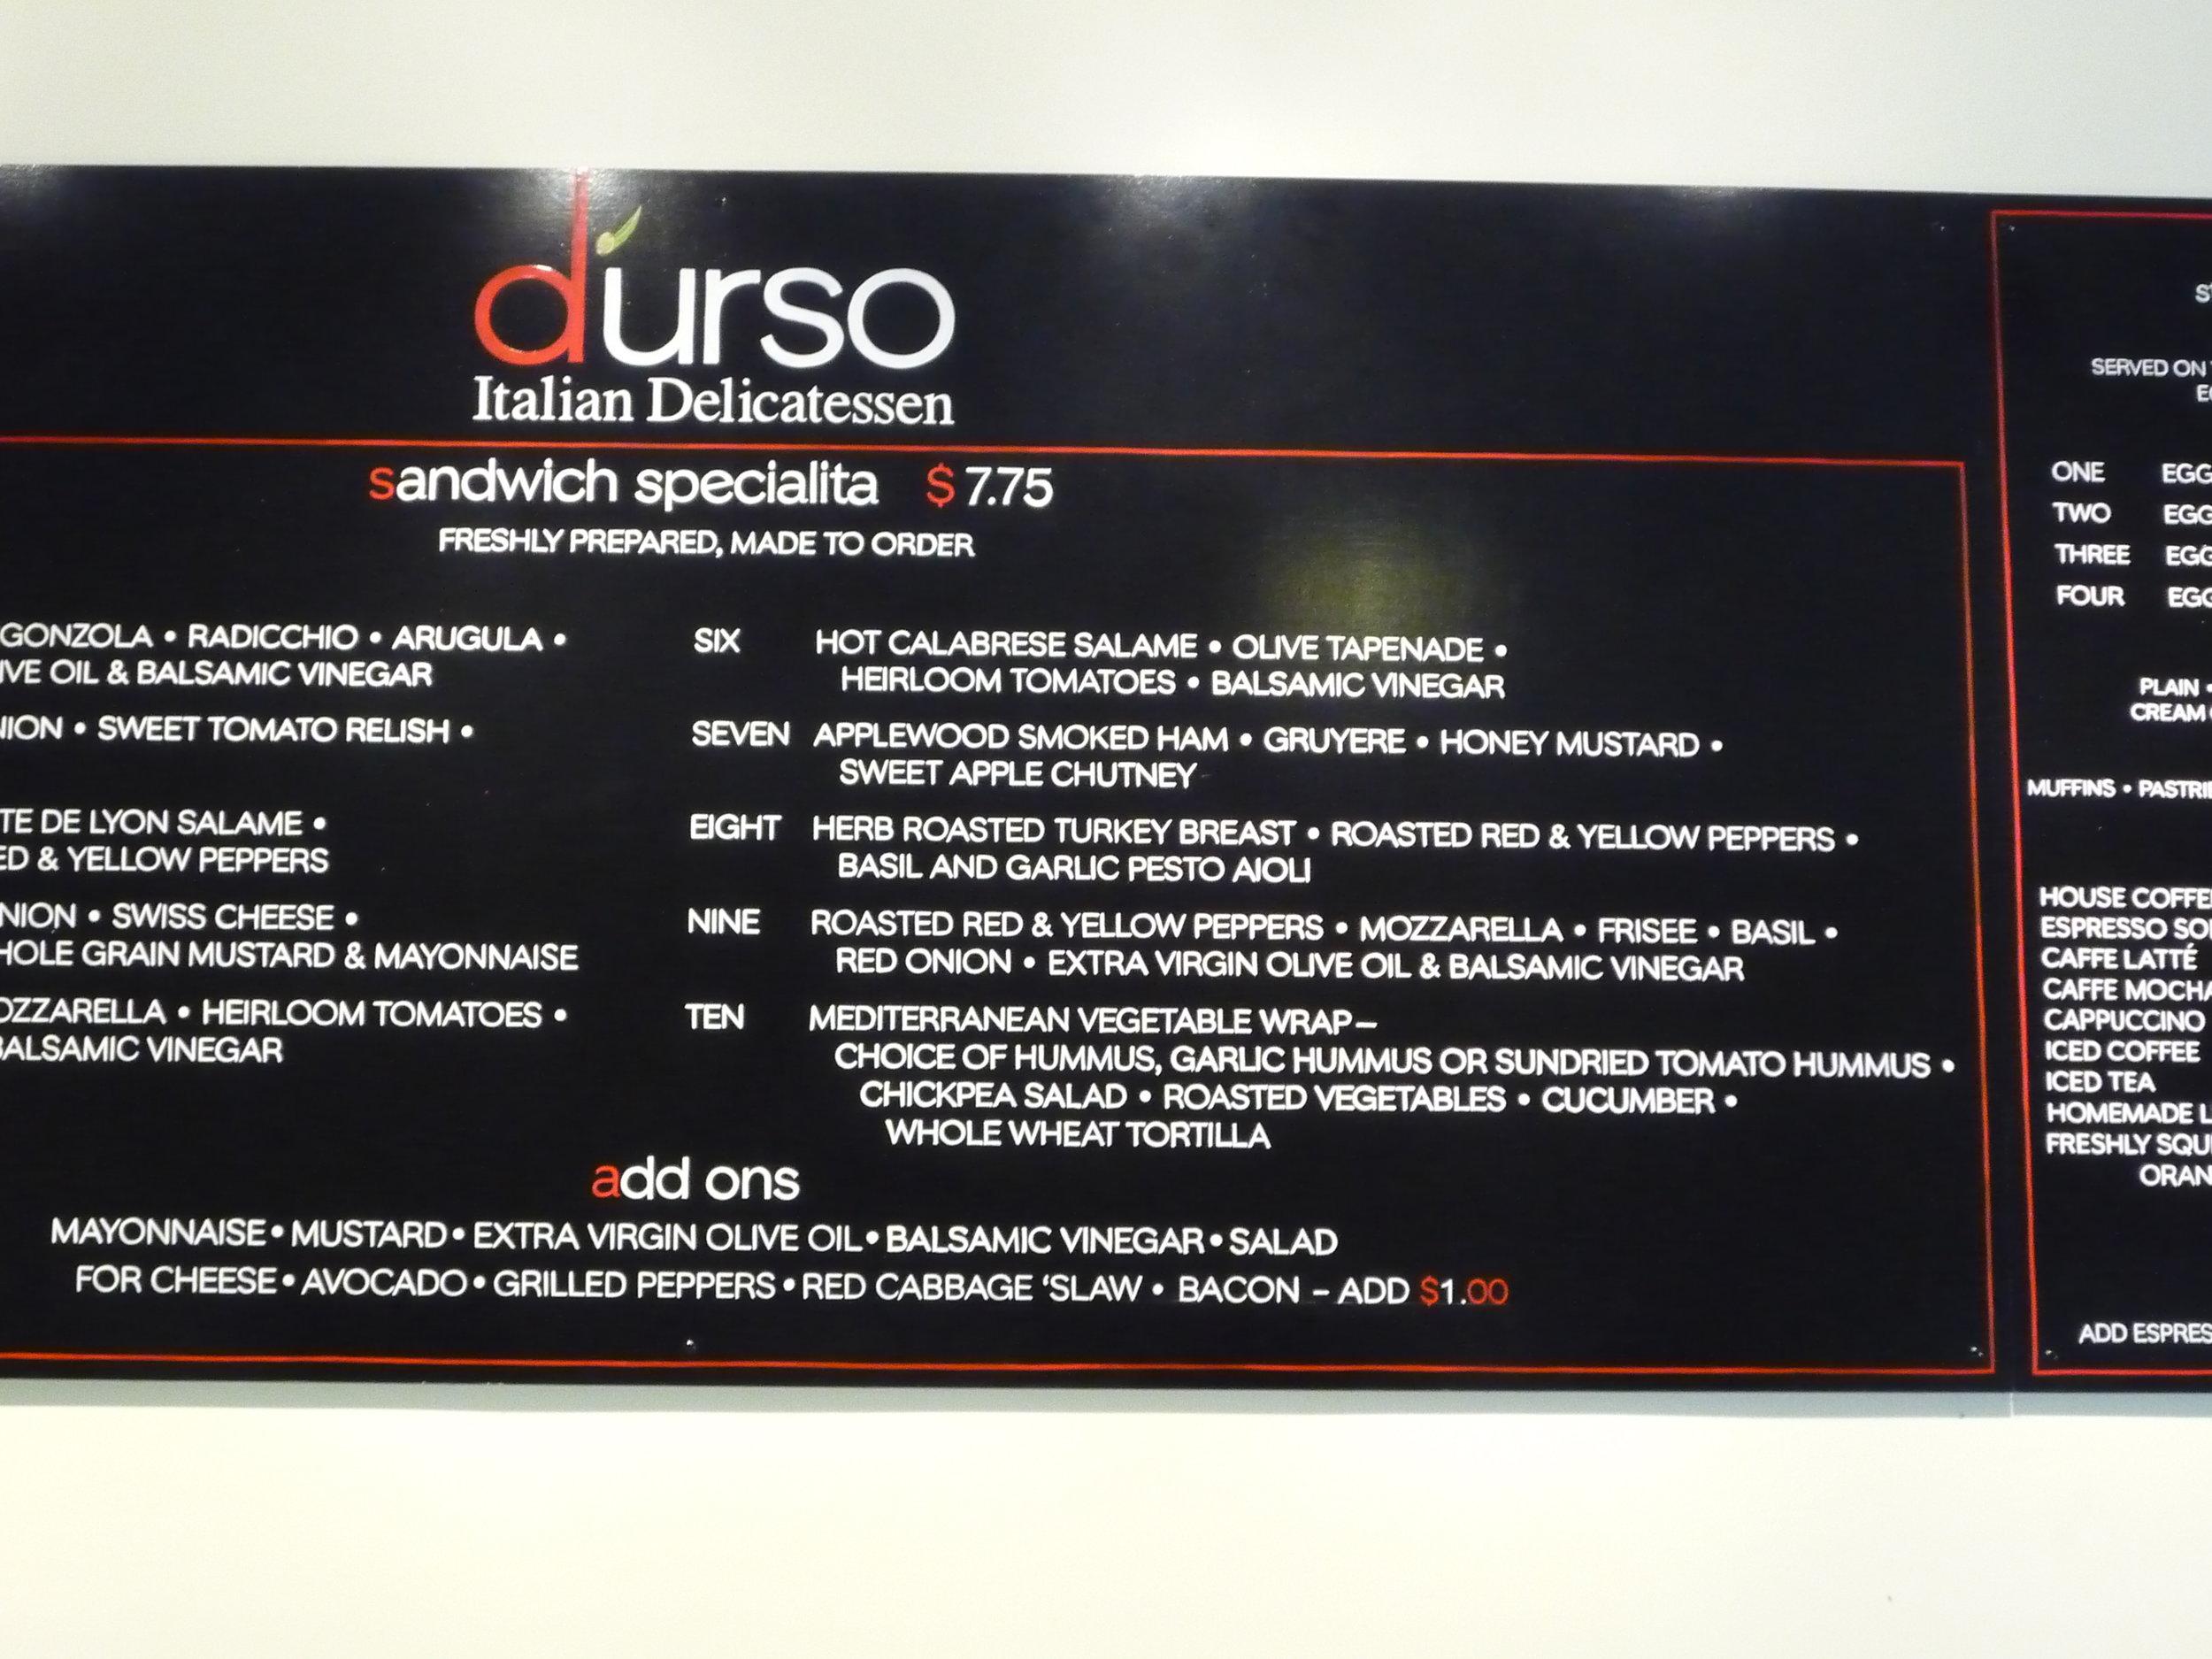 MENU-durso-menu-detail_4323728268_o.jpg